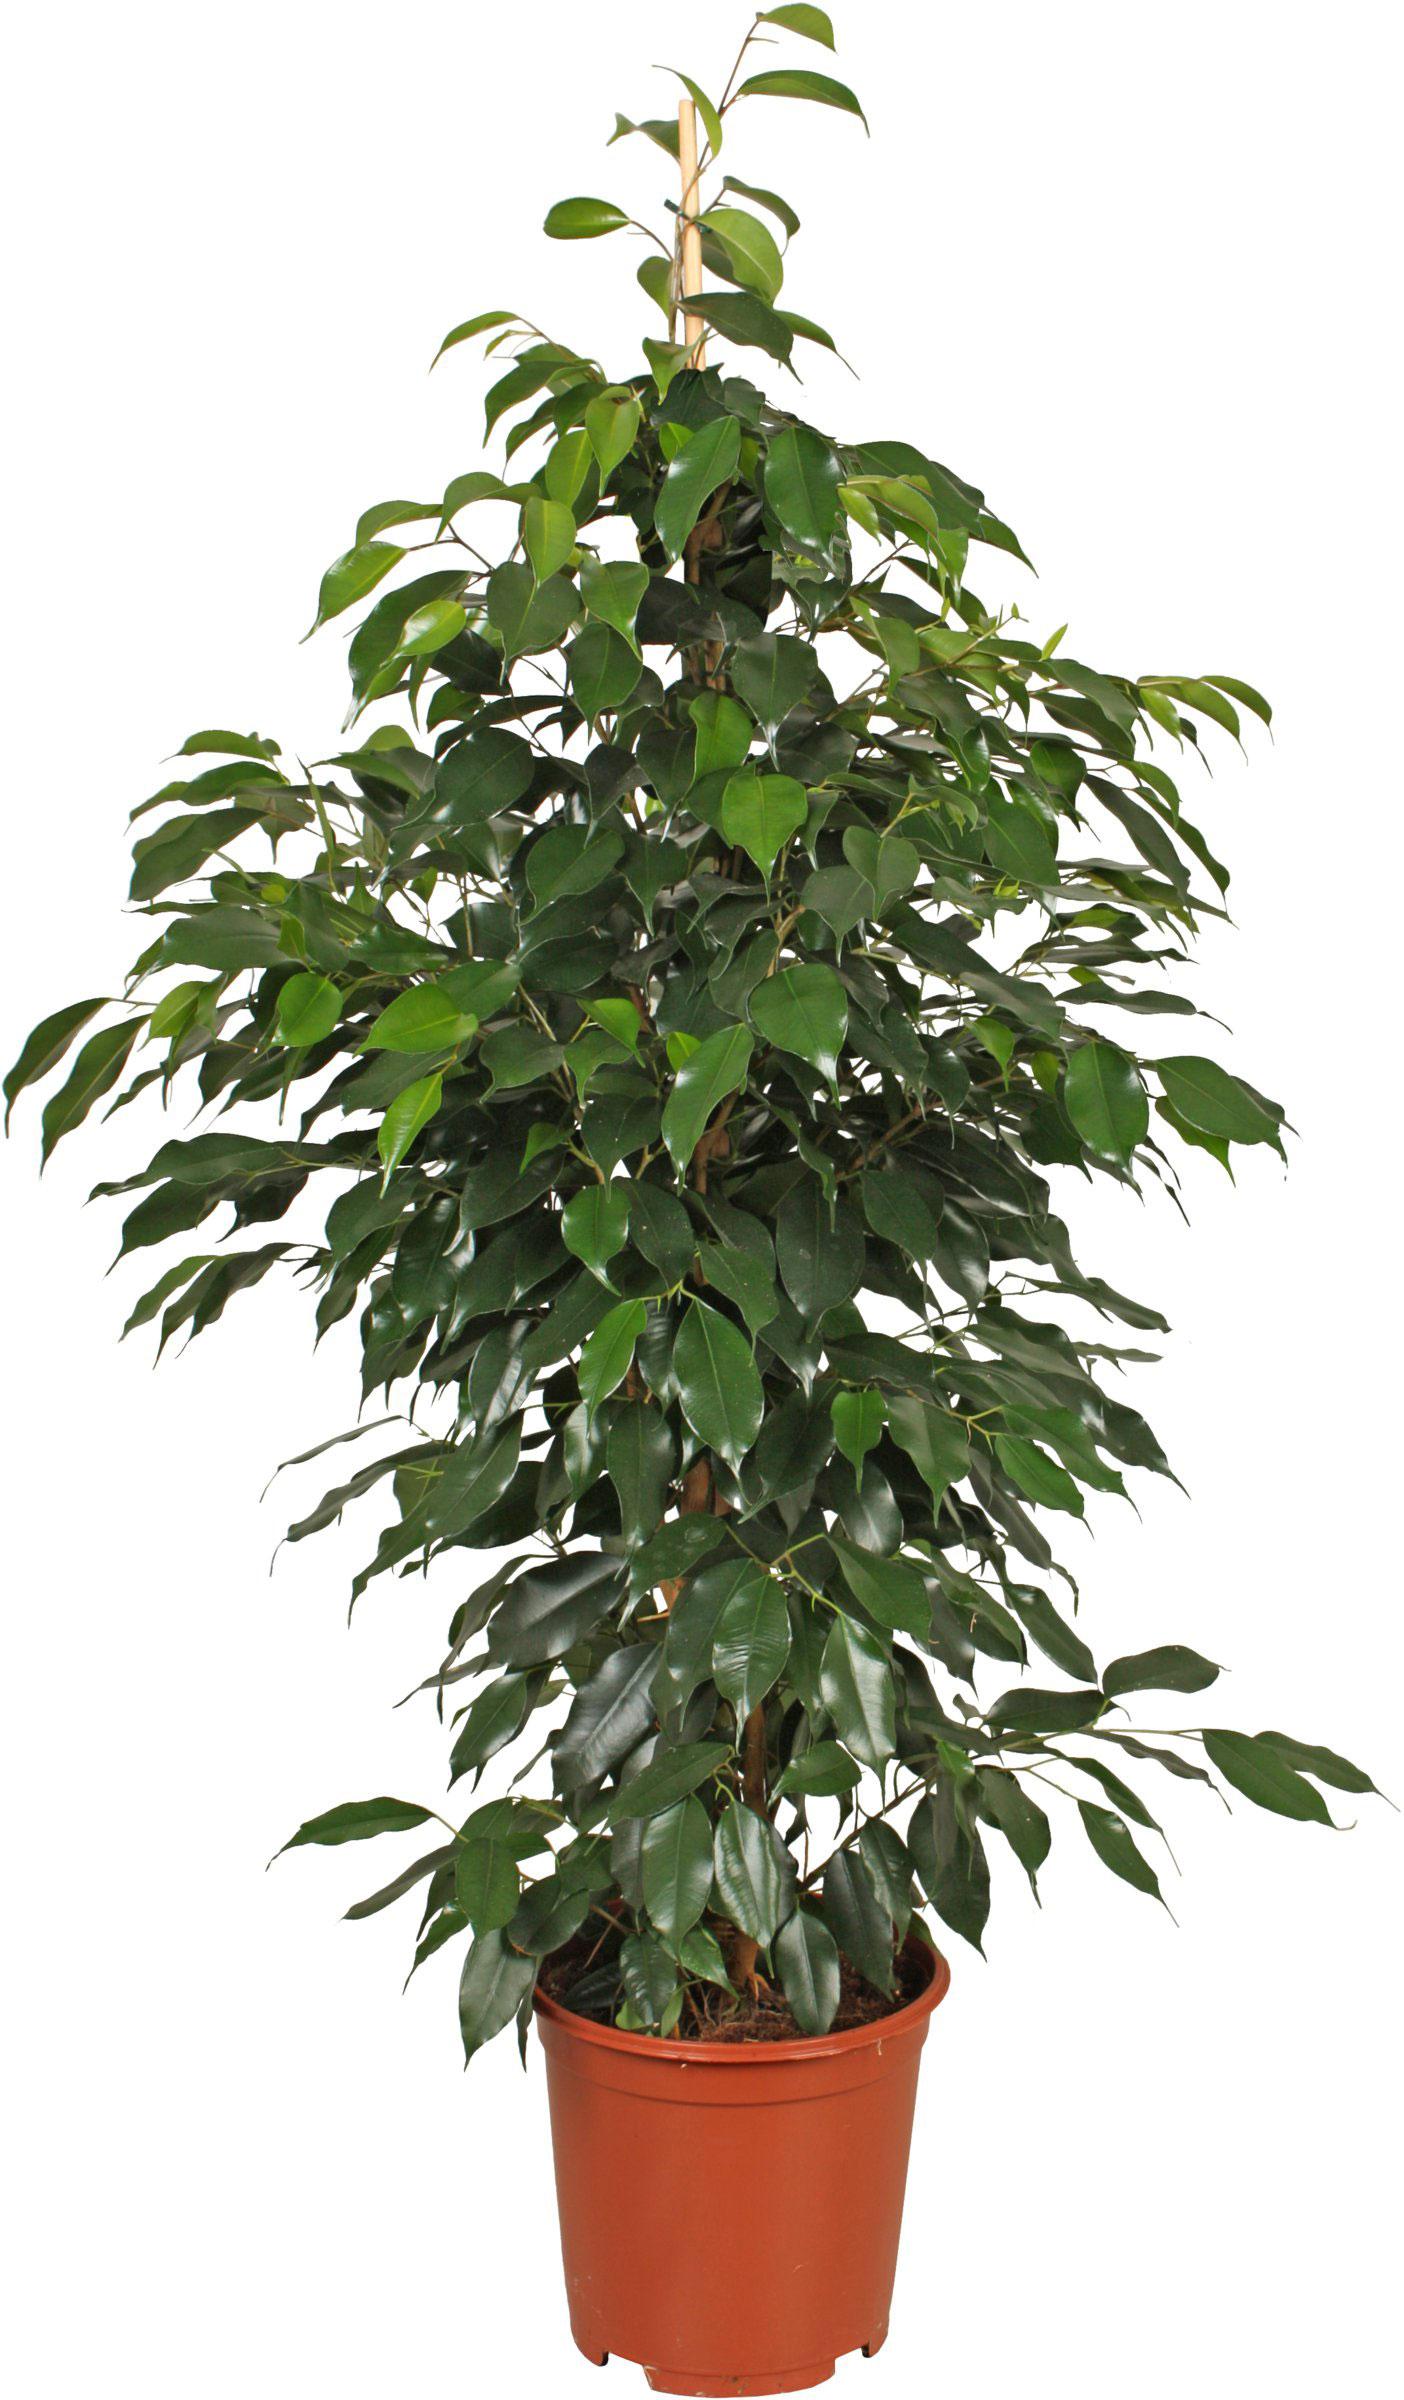 Ficus benjamina pianta da iterno for Piante sempreverdi da appartamento